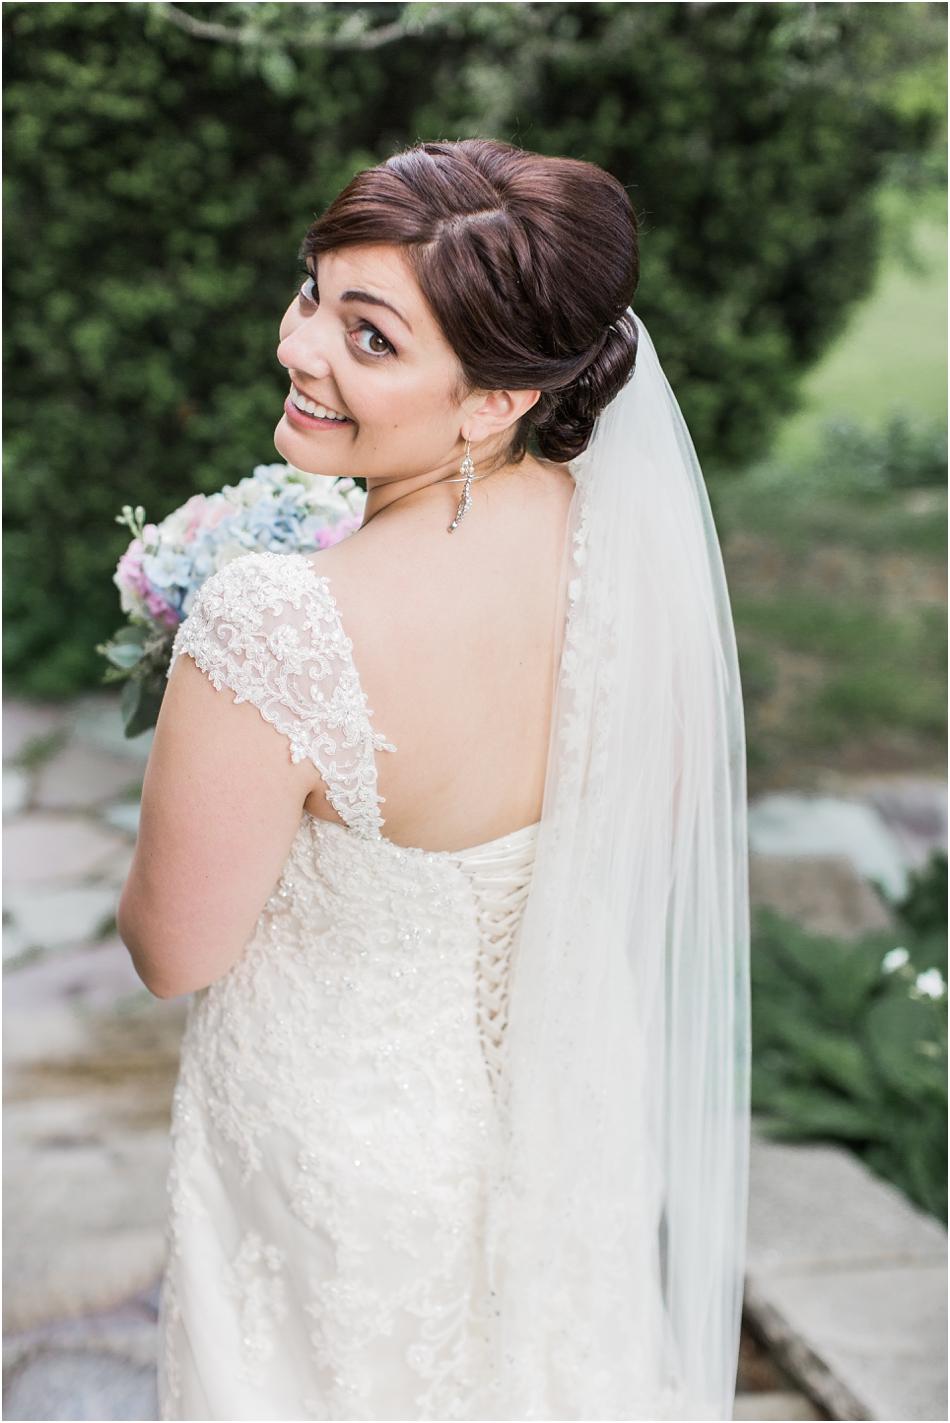 overbrook_house_buzzards_bay_boston_massachusetts_cape_cod_new_england_wedding_photographer_Meredith_Jane_Photography_photo_1590.jpg